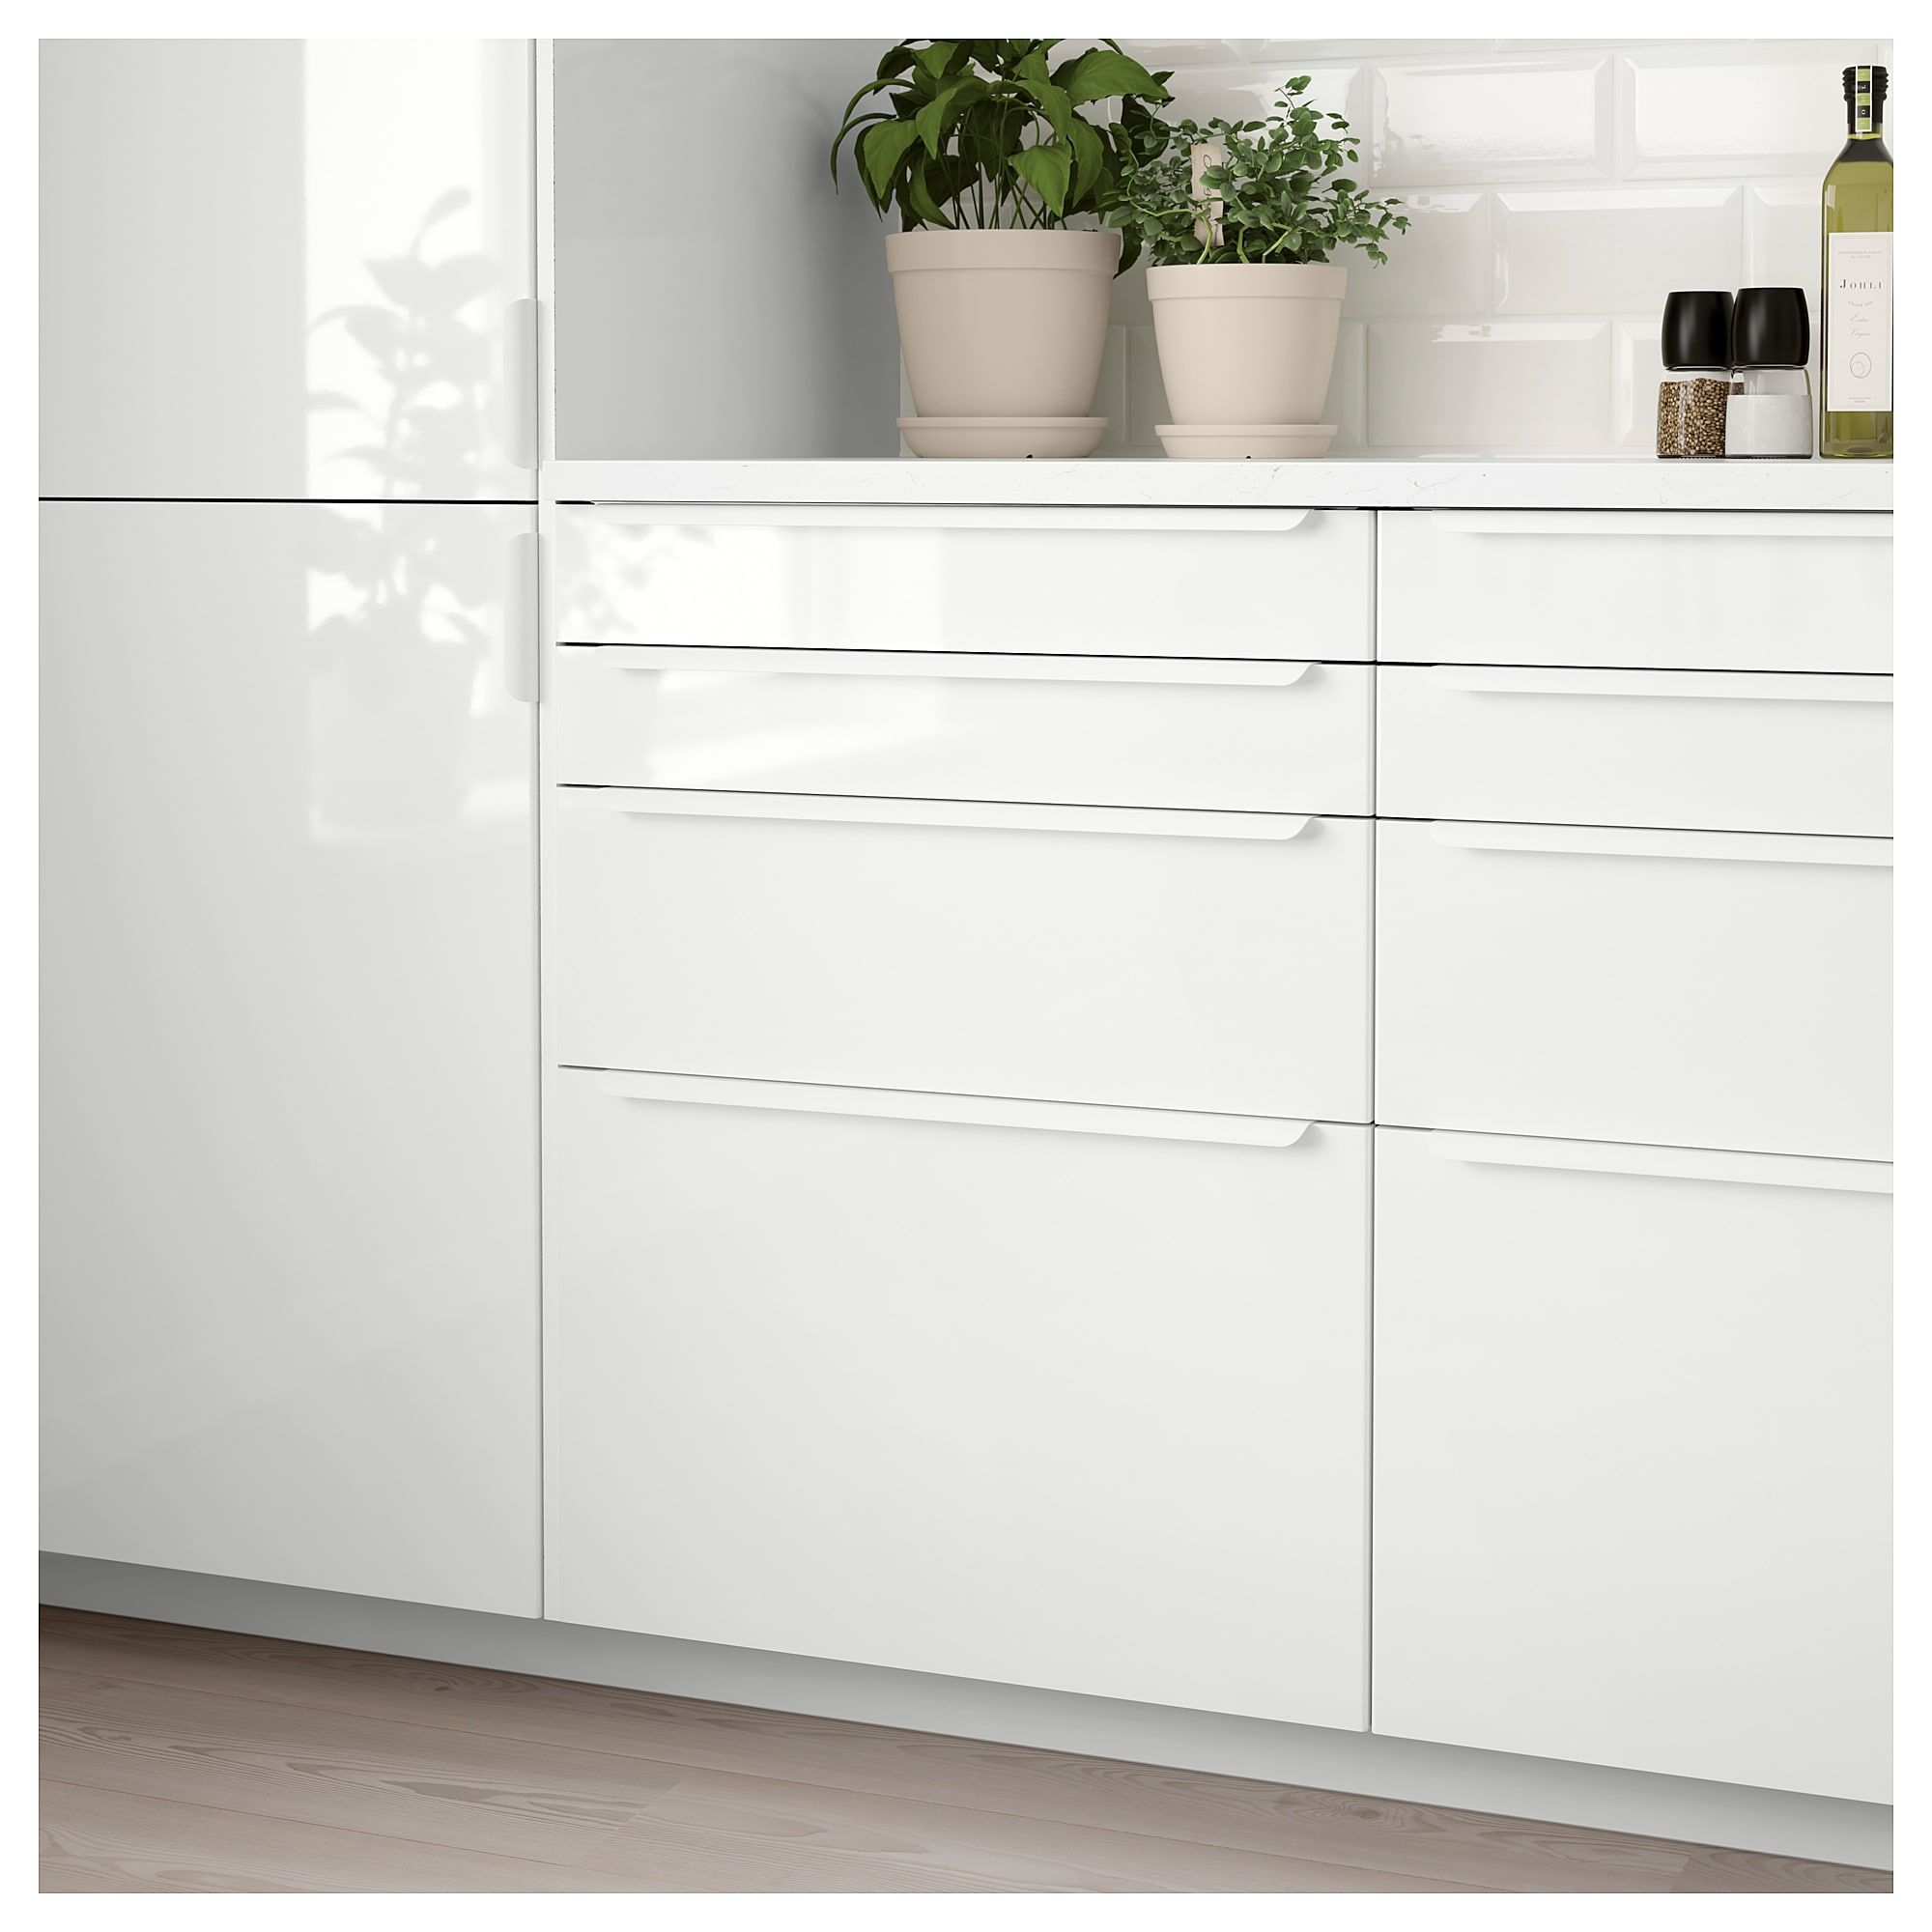 Ikea Kommode Hochglanz Weiß 2021